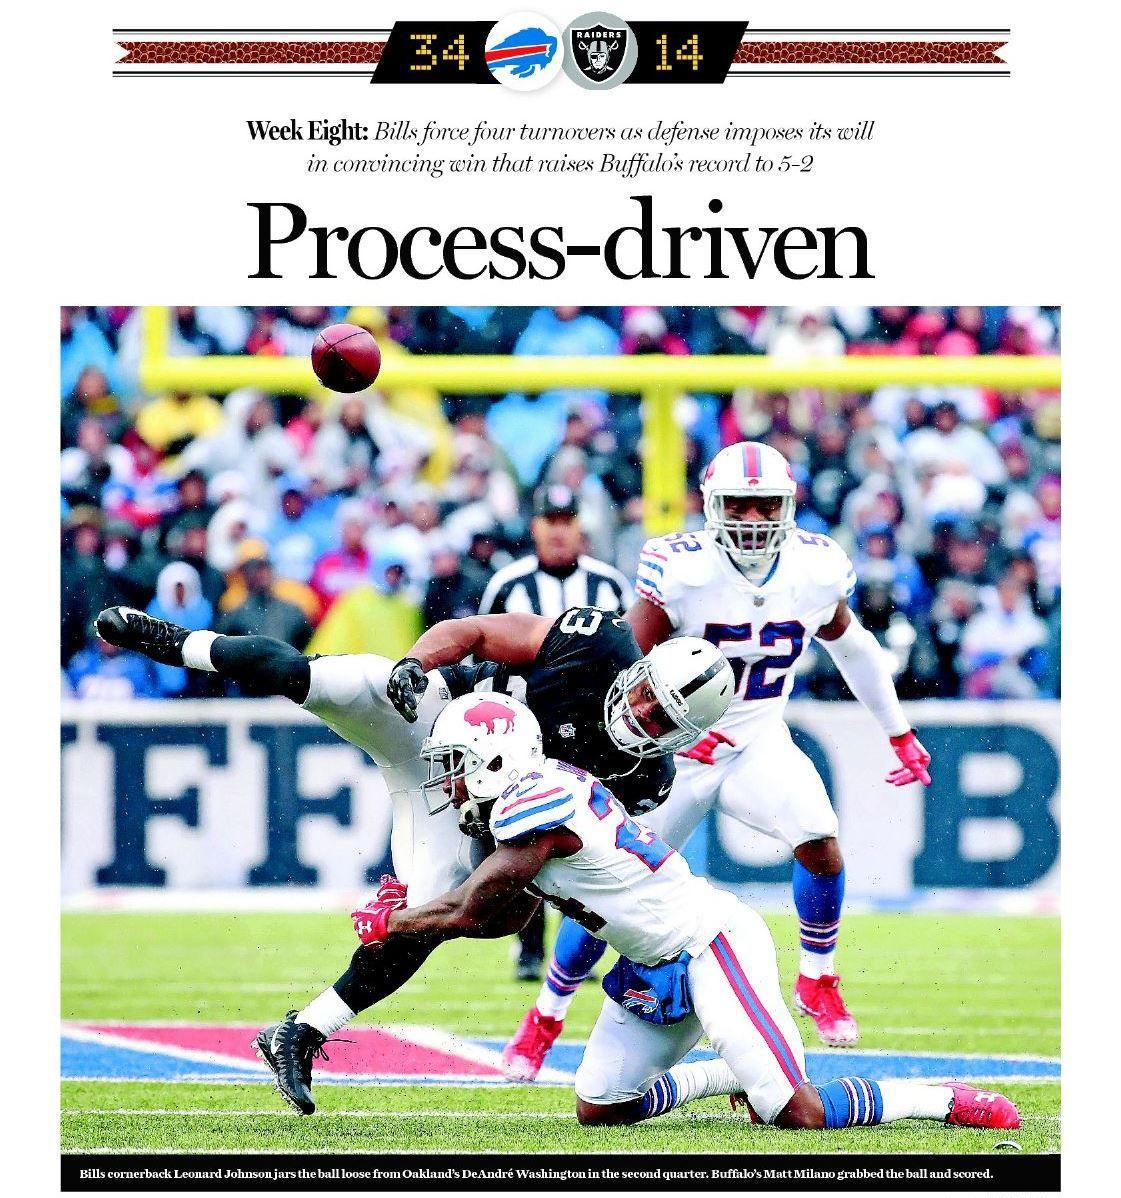 The-Buffalo-News_The-Buffalo-News_2017_October_30_Buffalo-News_Central_B_GEI-NULL_1_01